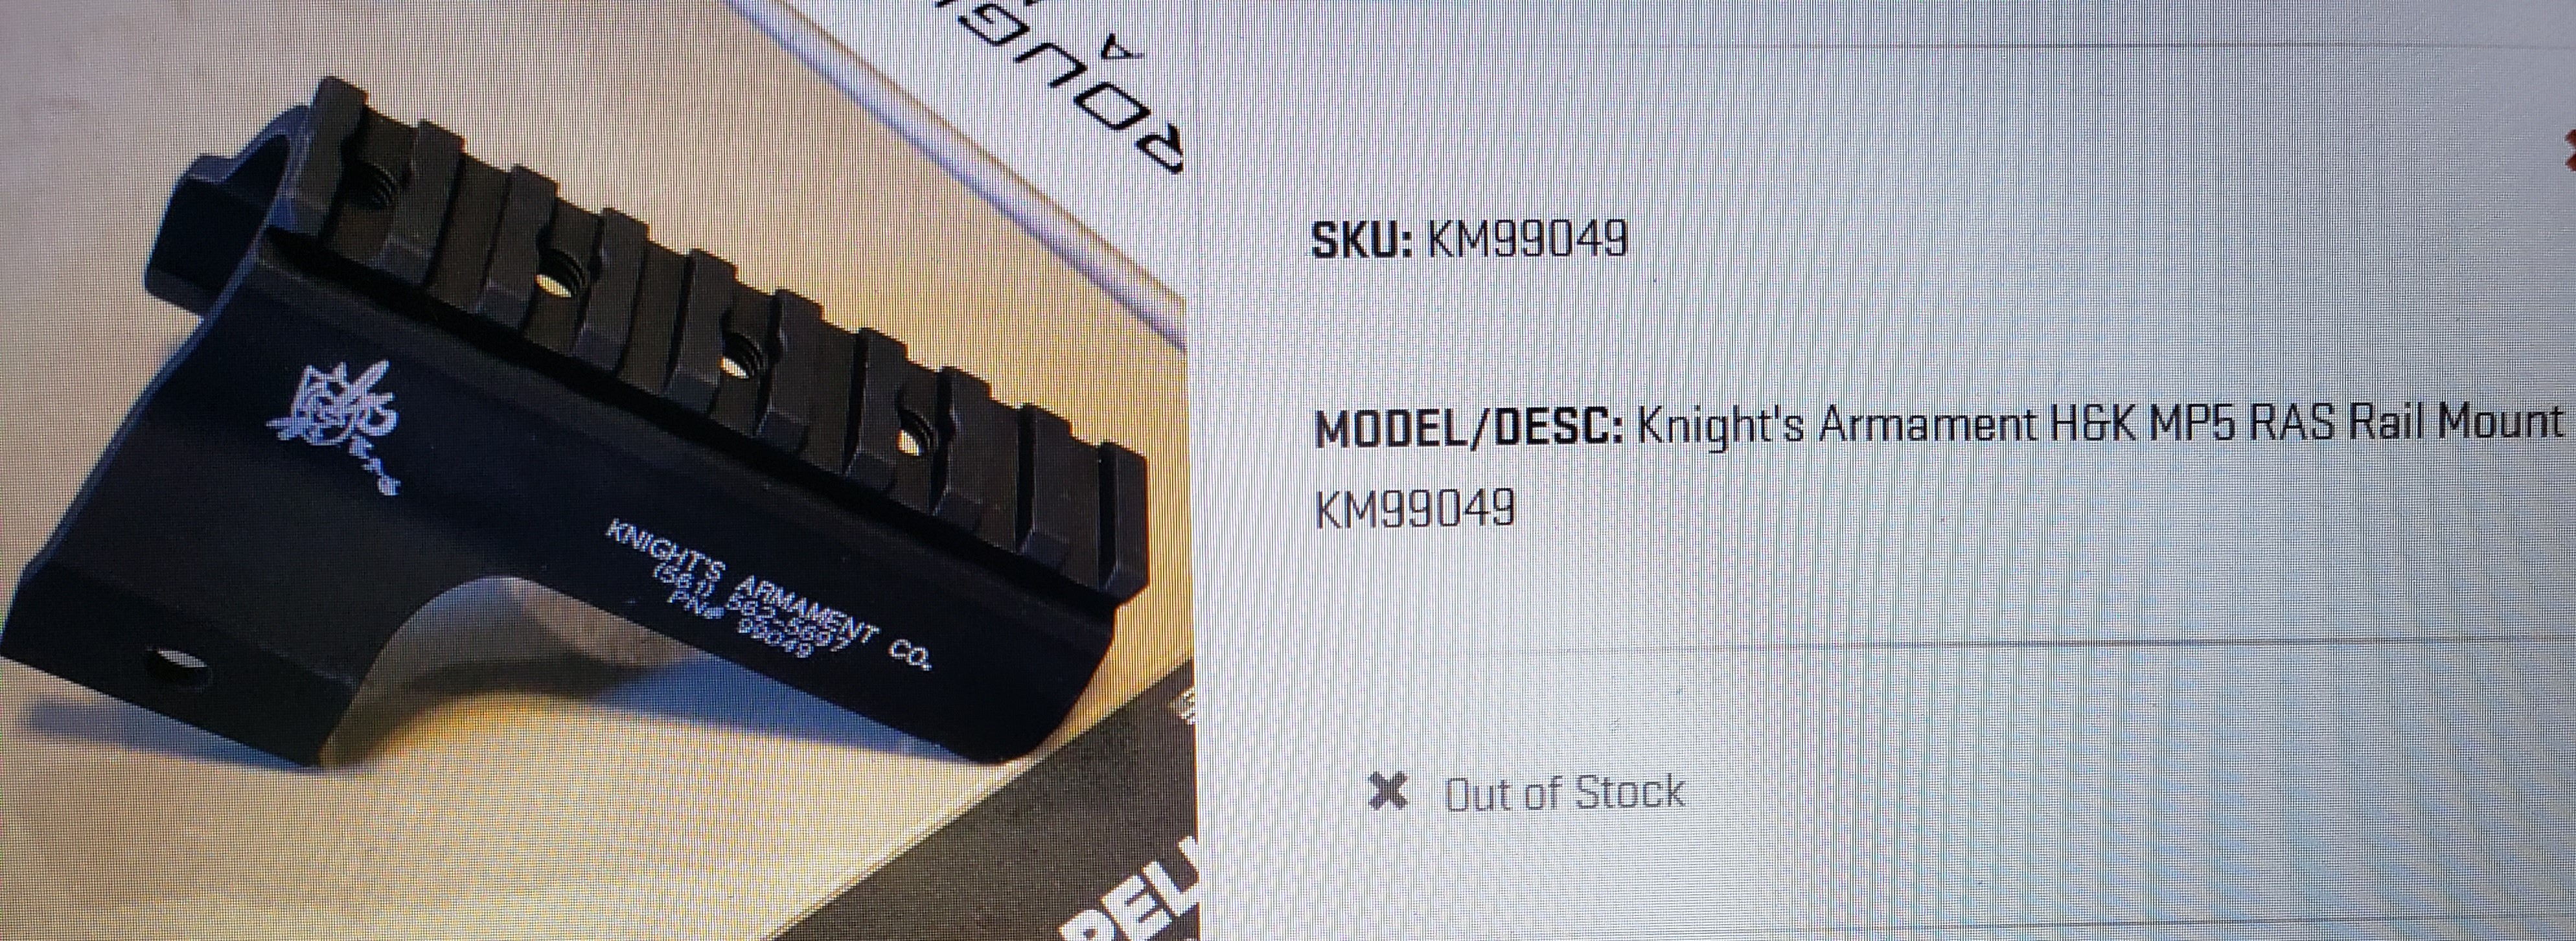 HK MP5/HK53 Surefire tri-rail Hand guards-ras-2-.jpg